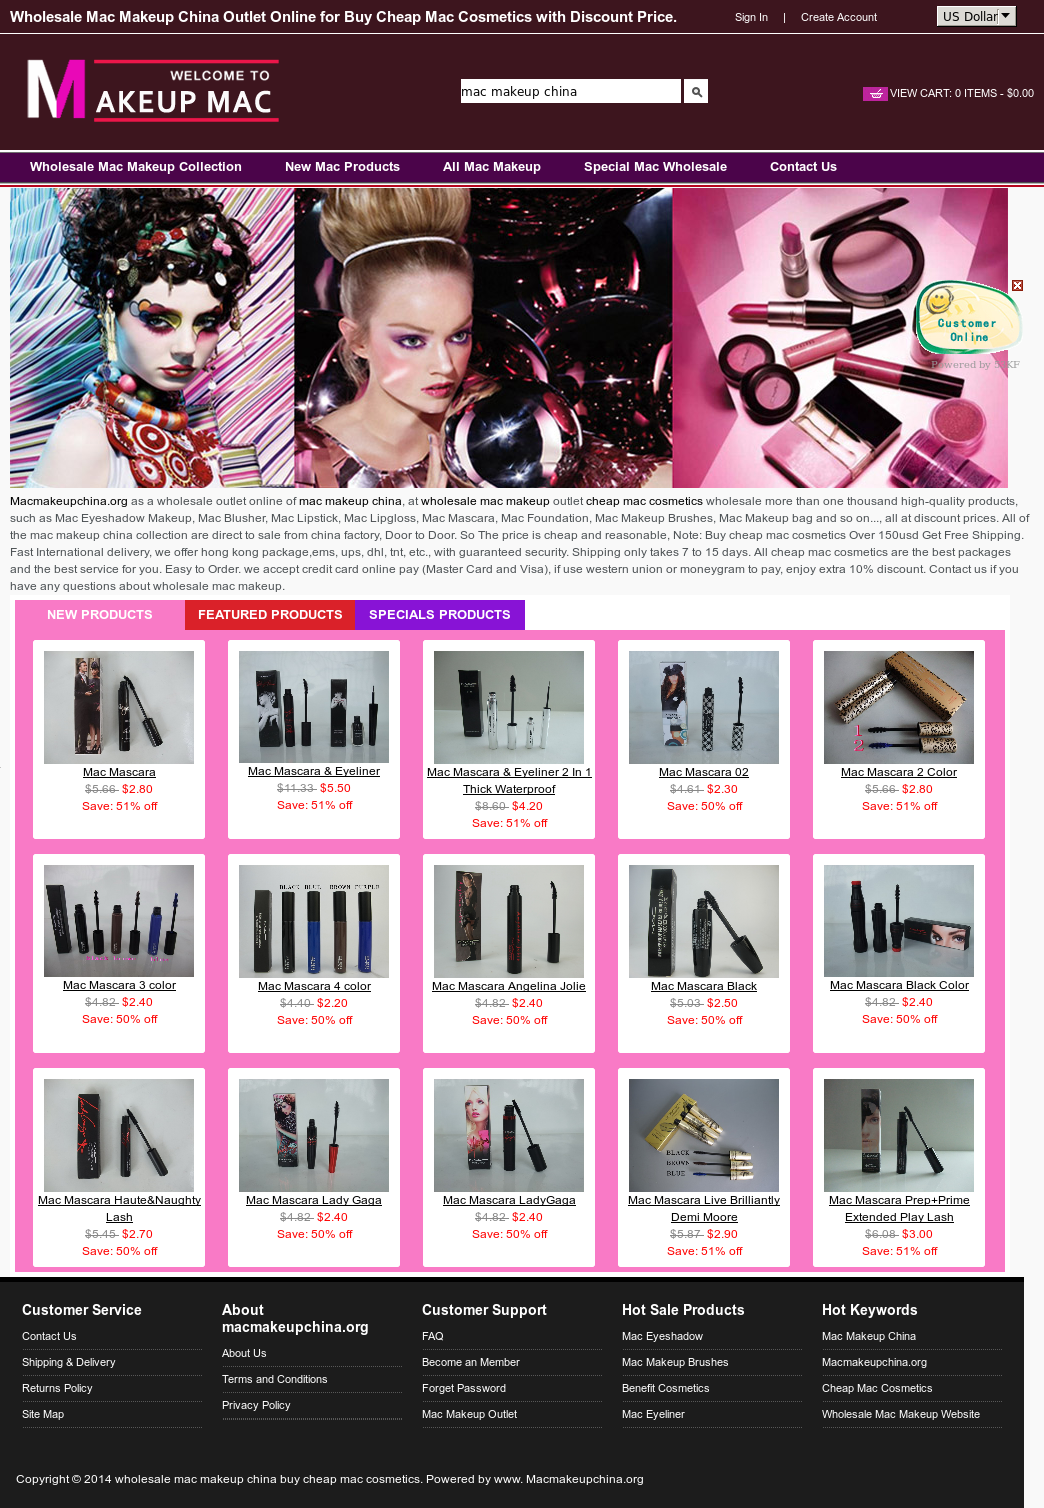 Whole Mac Makeup China Cheap